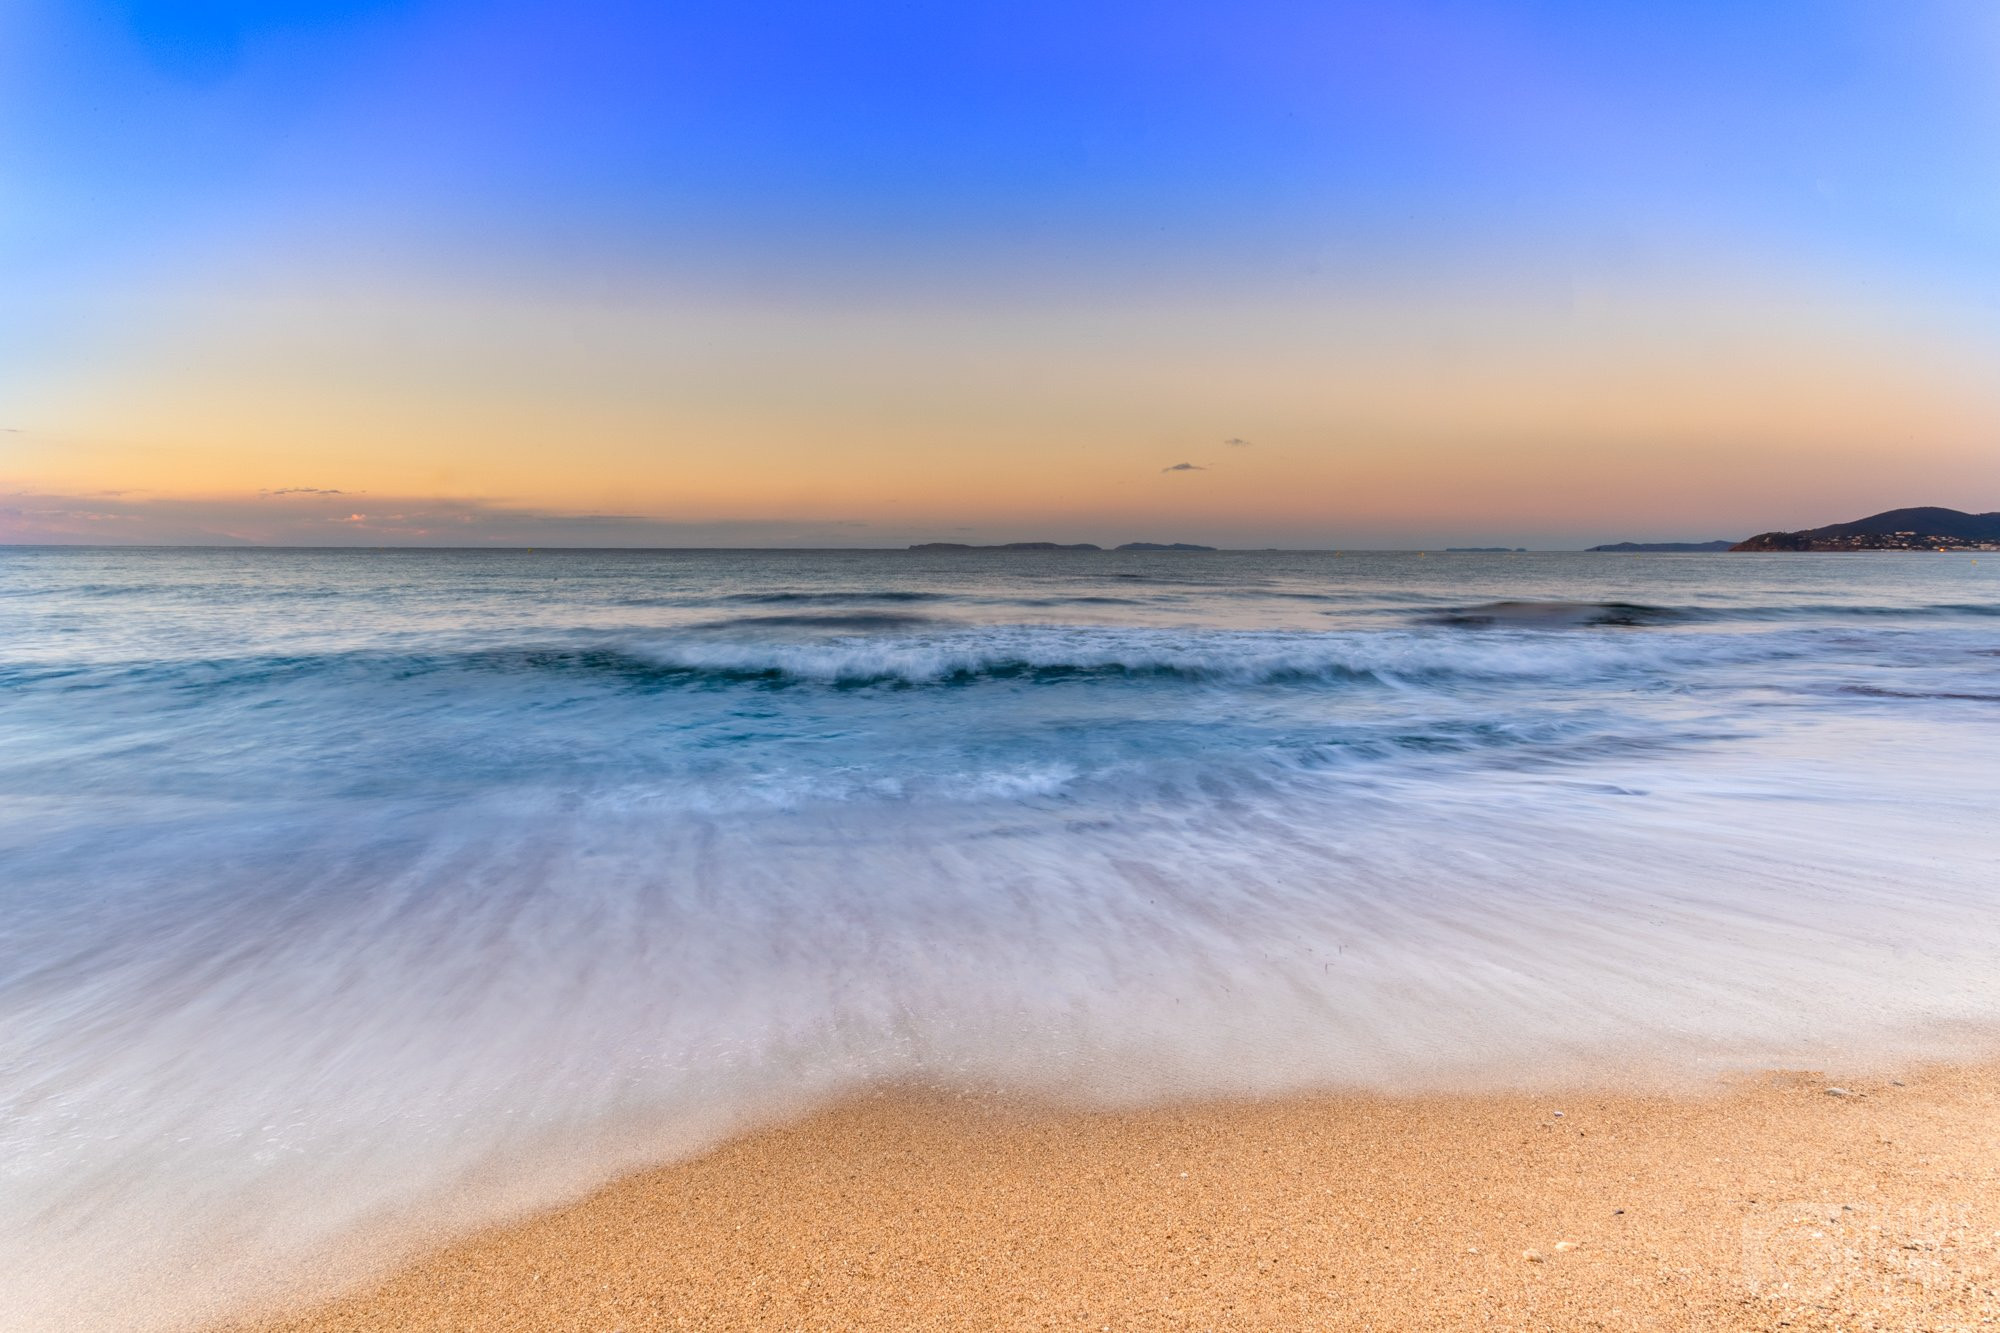 Sunrise on Gigaro beach, gulf of Saint-Tropez